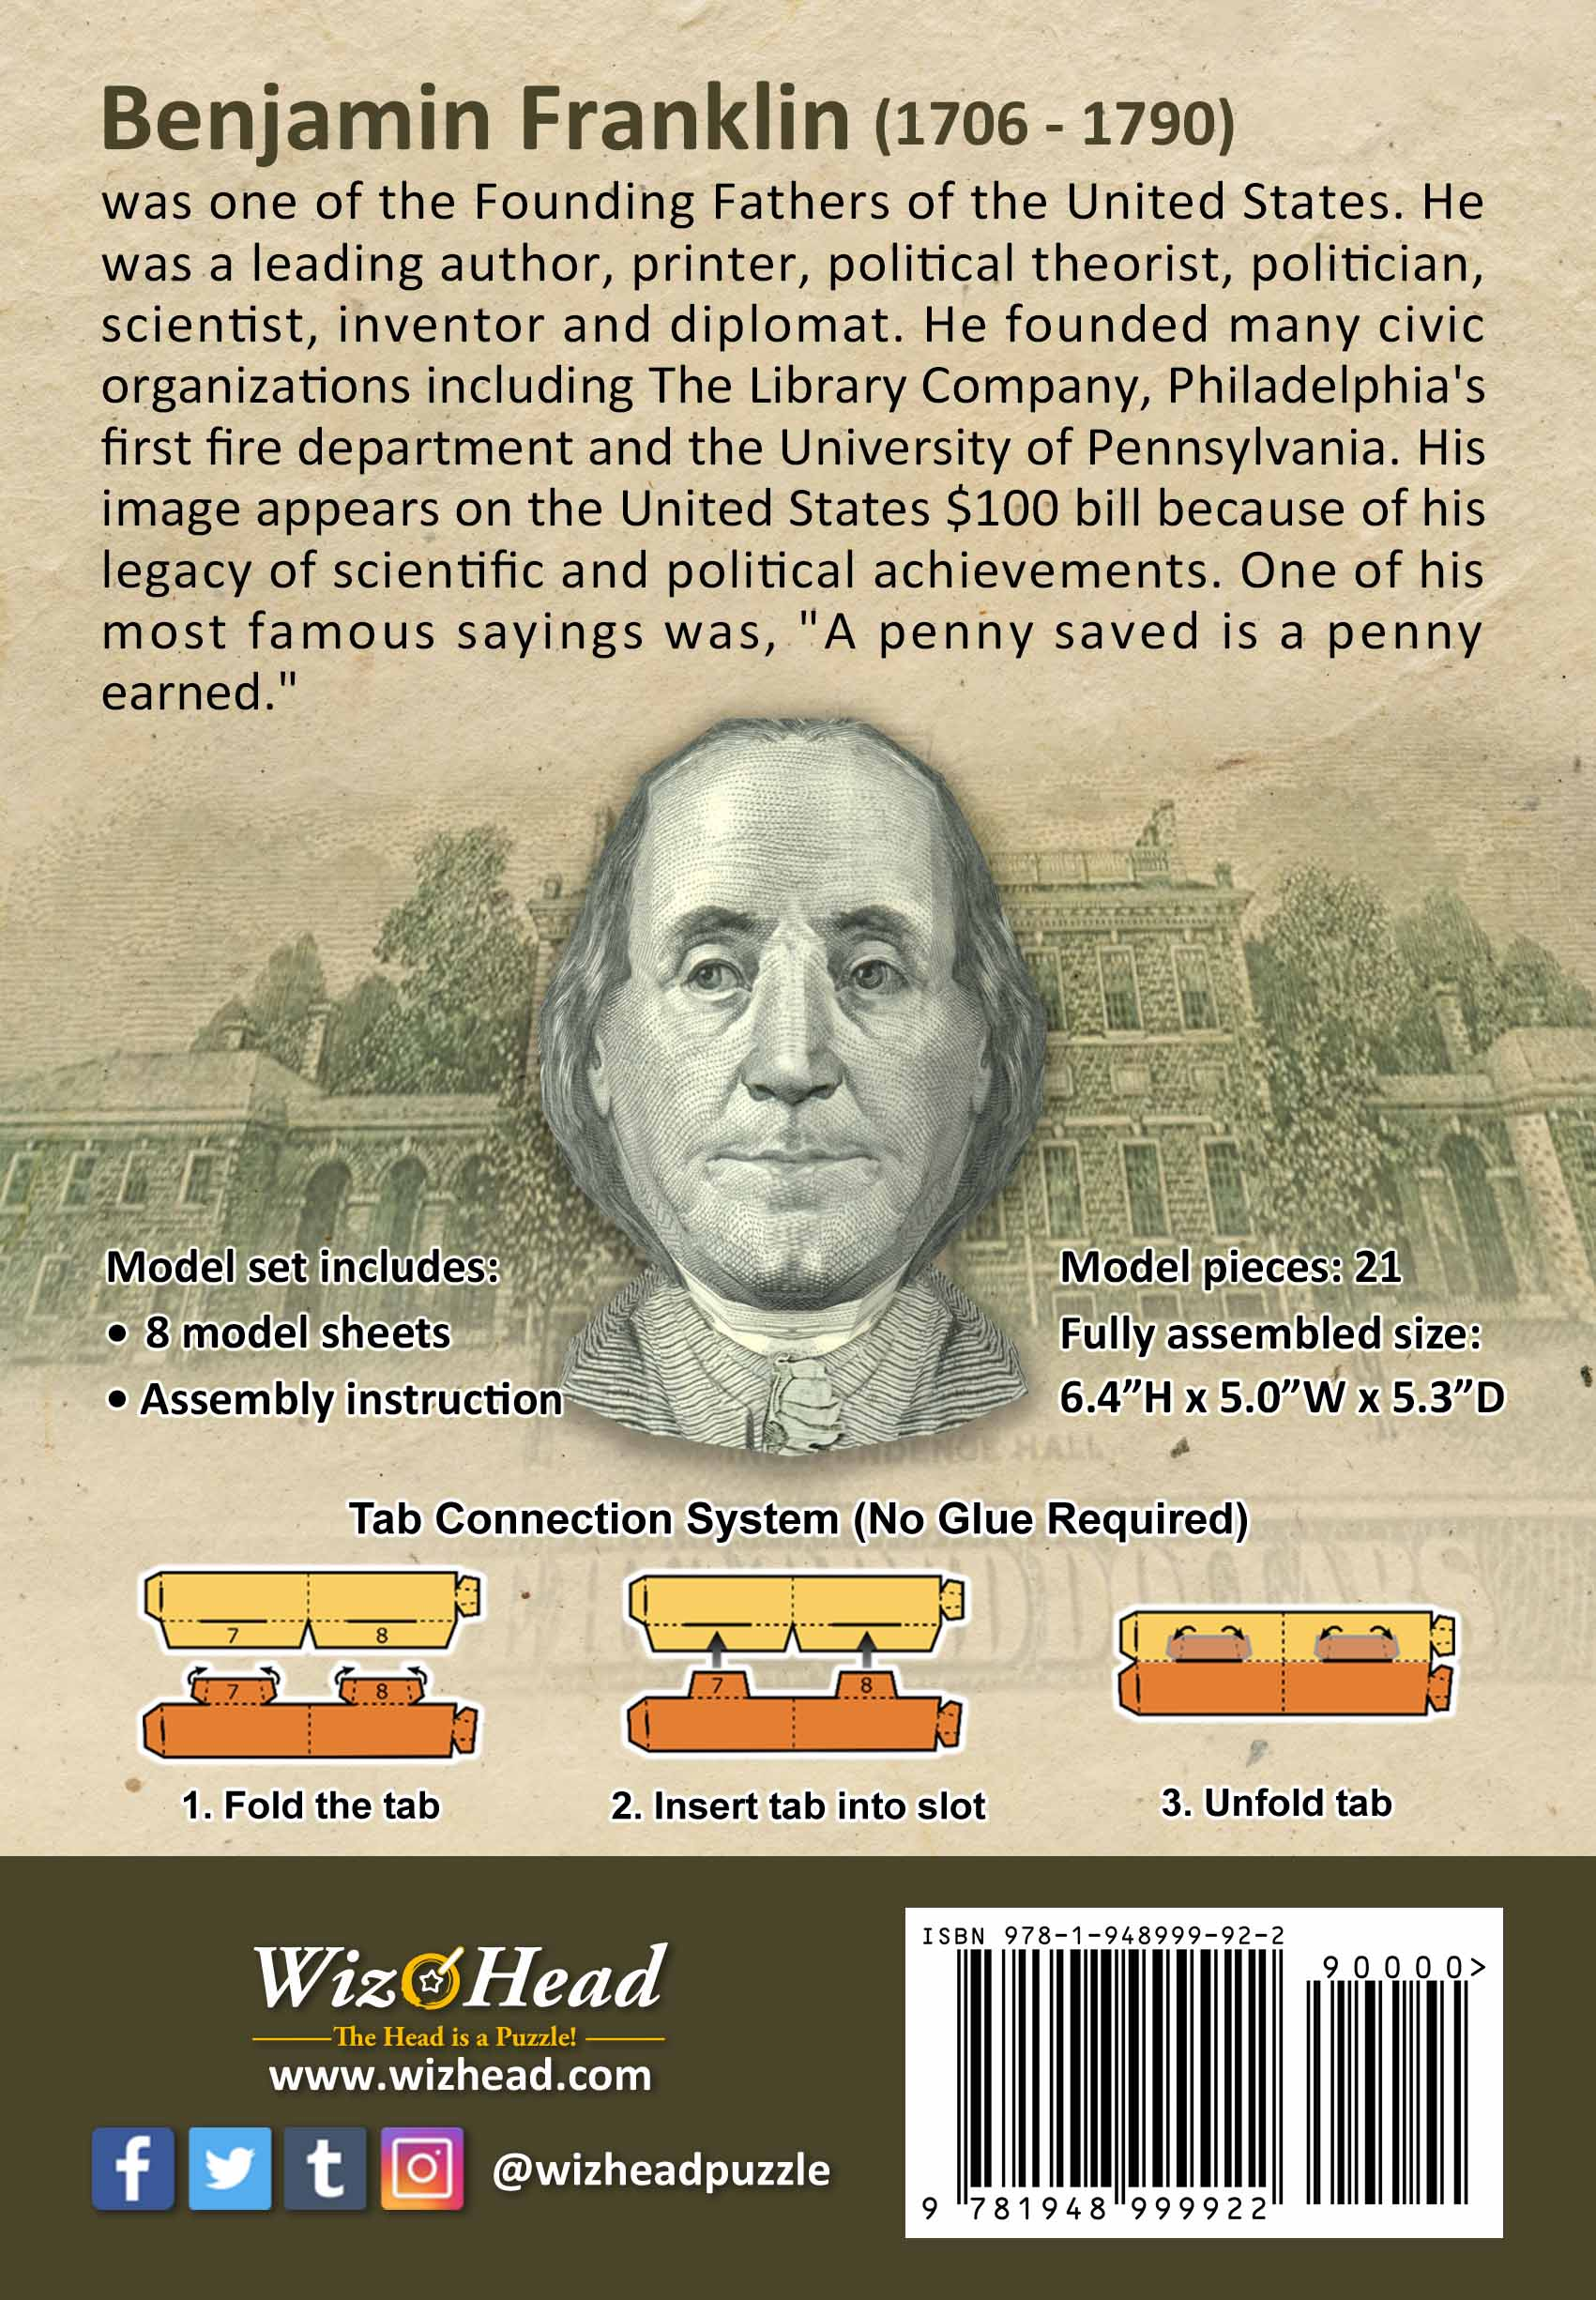 US $100 Bill- Benjamin Franklin (Full Size)